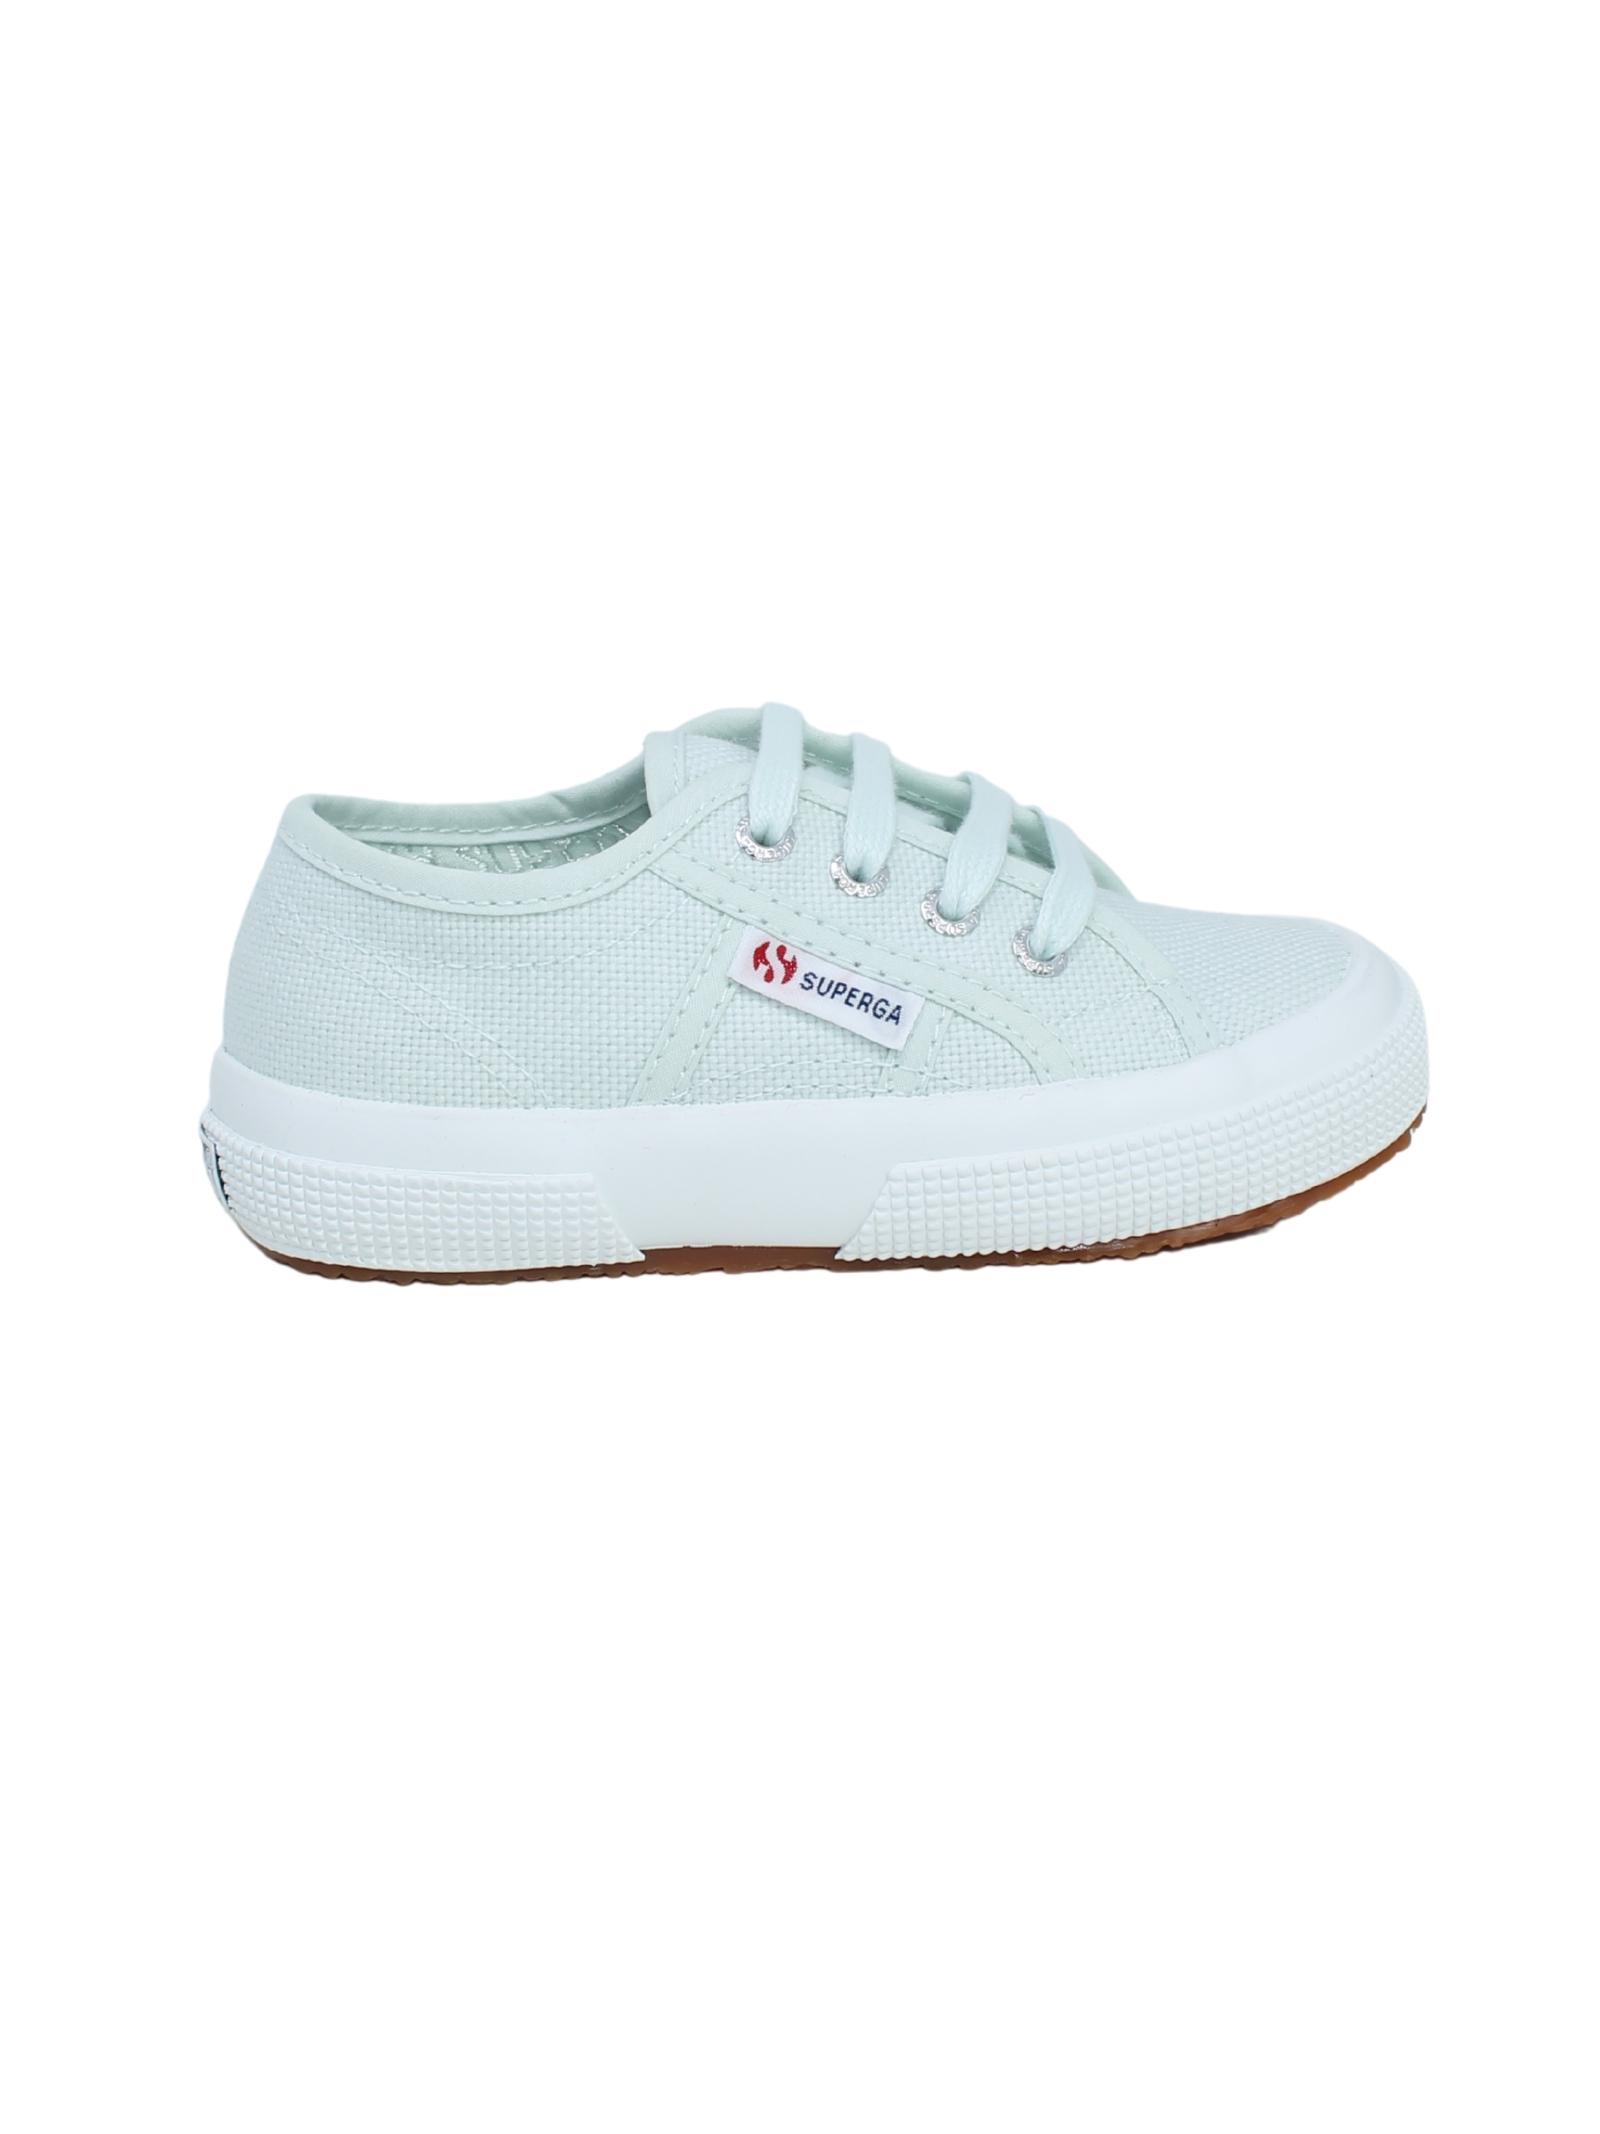 SUPERGA KIDS | Sneakers | 2750S00003C0W2P